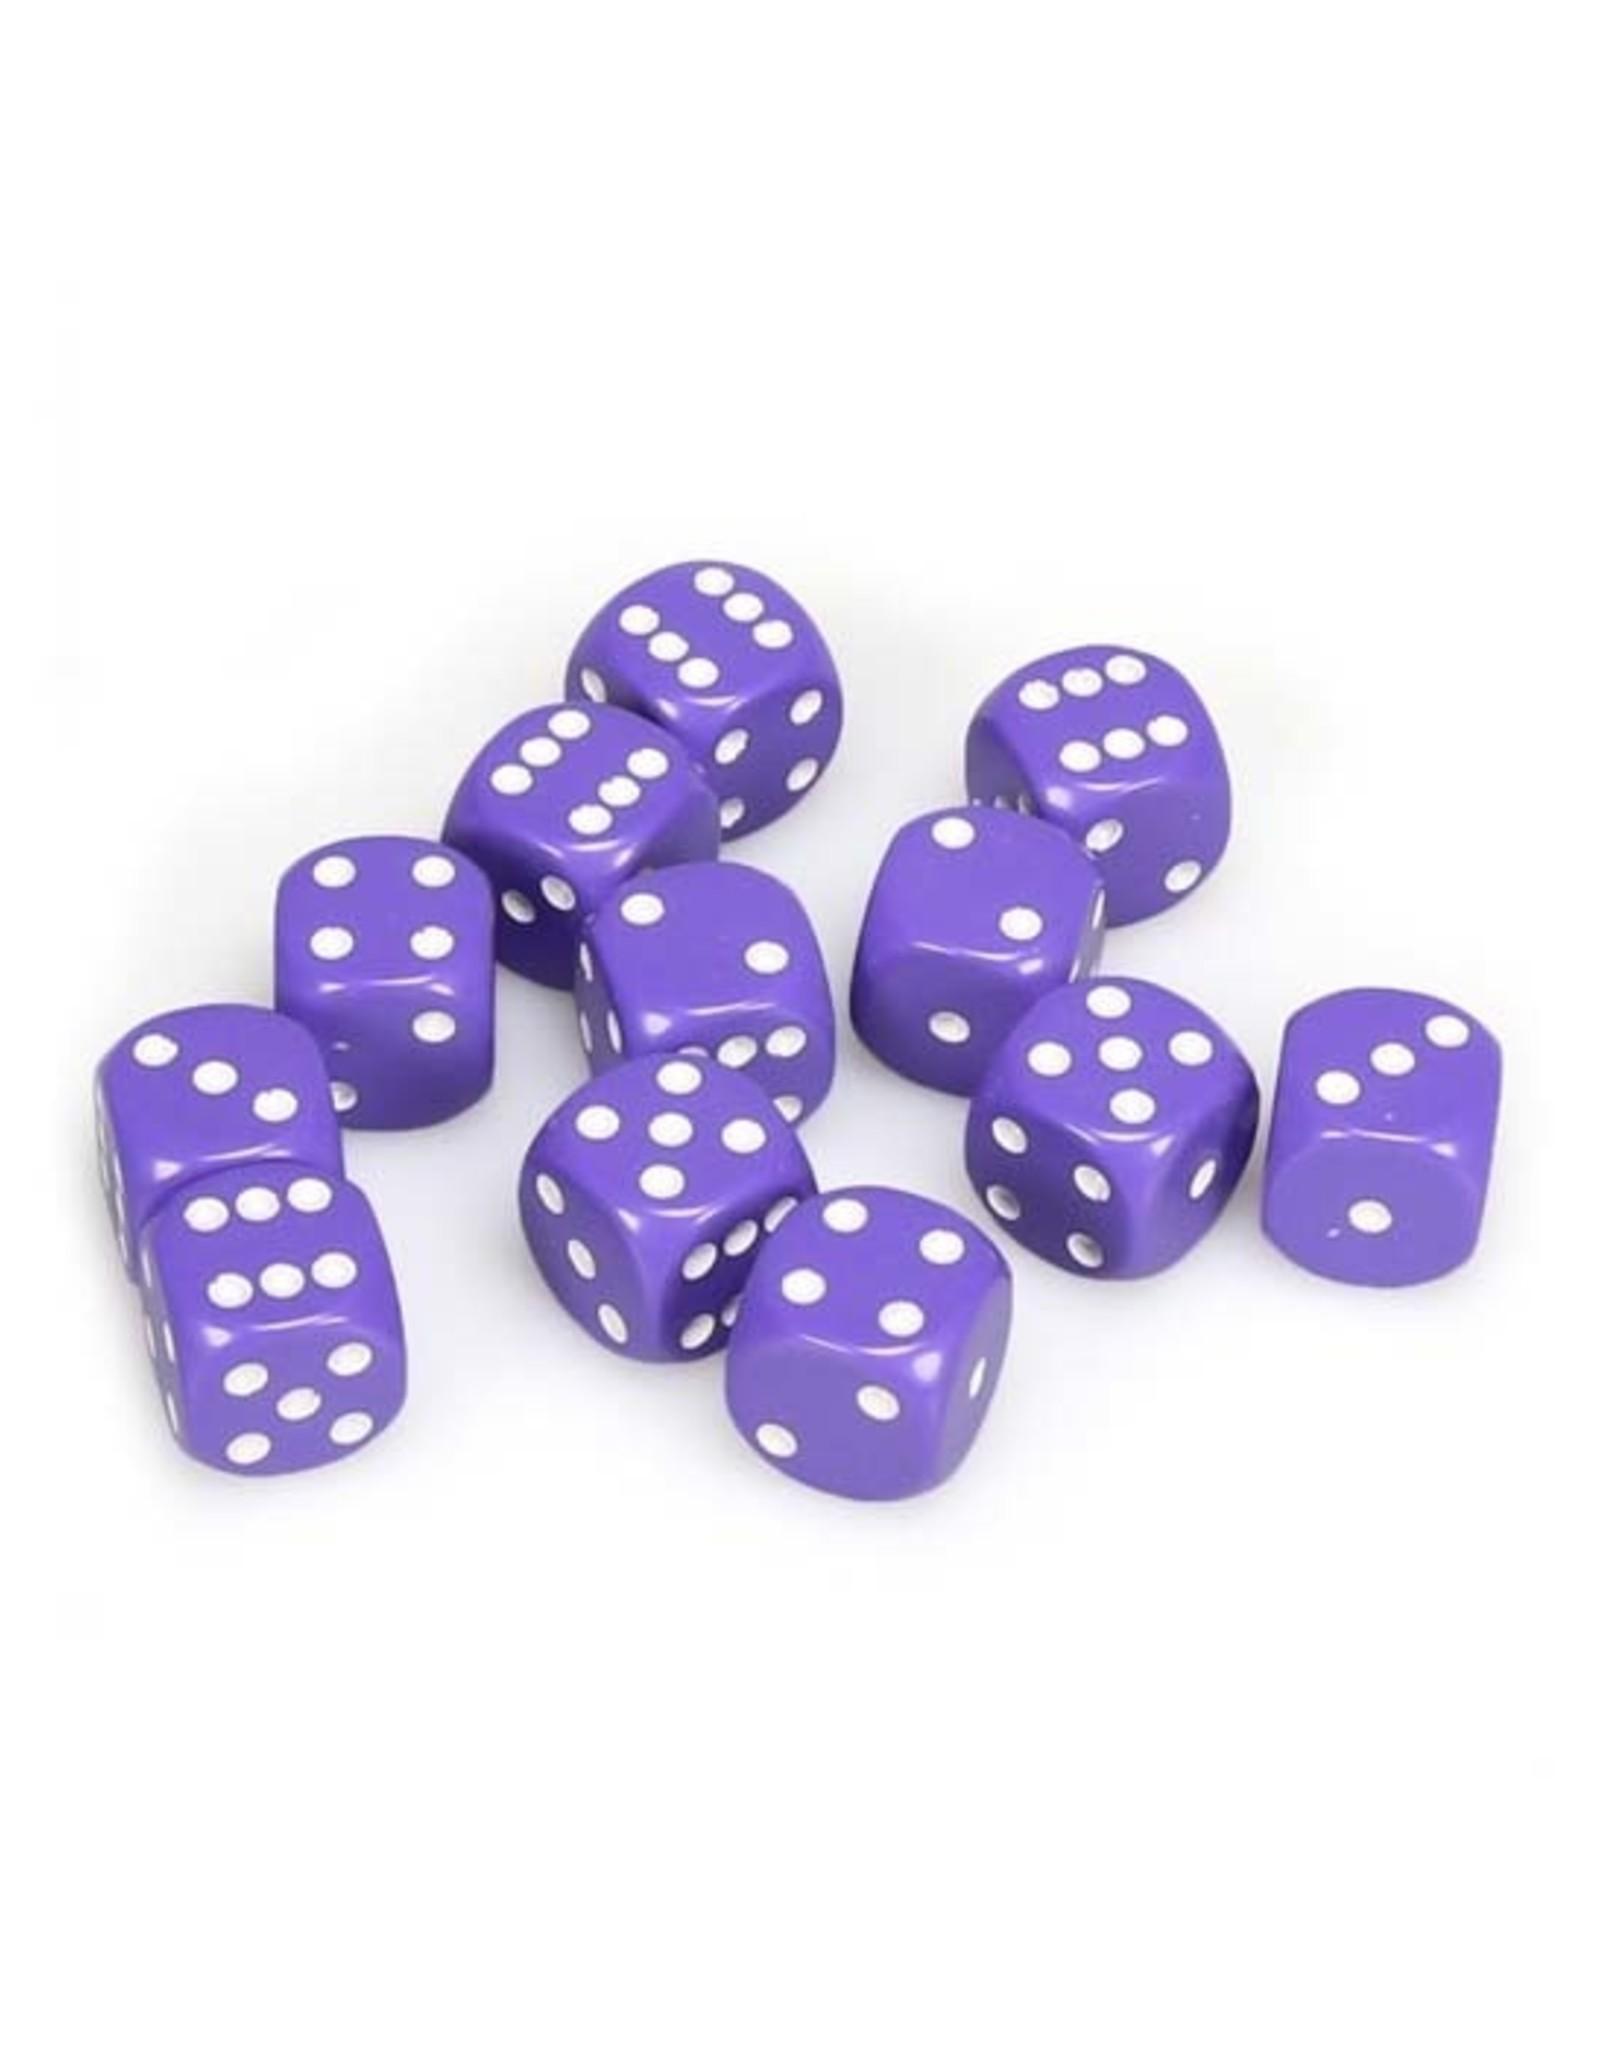 Chessex Chessex: 16mm D6 - Opaque - Purple w/ White